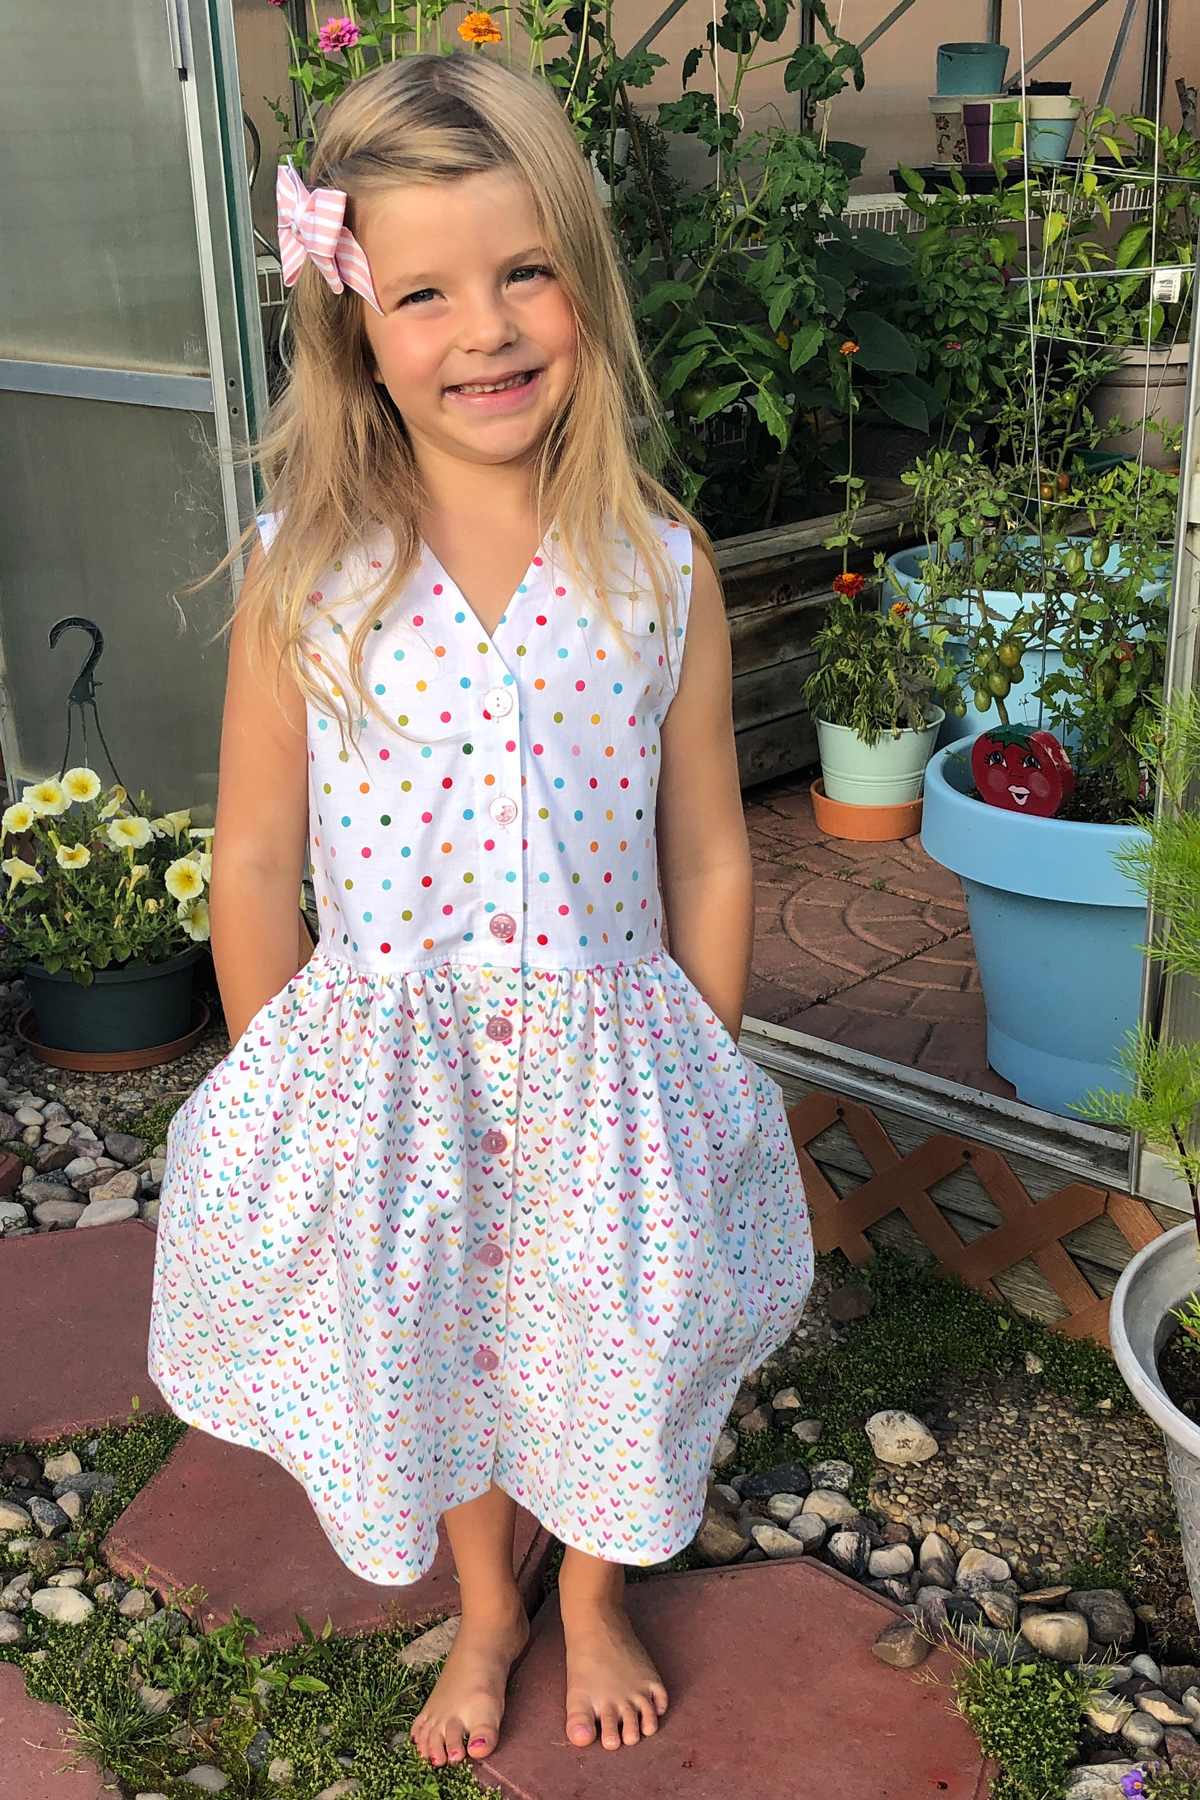 Krystle's Mini Darling Ranges dress